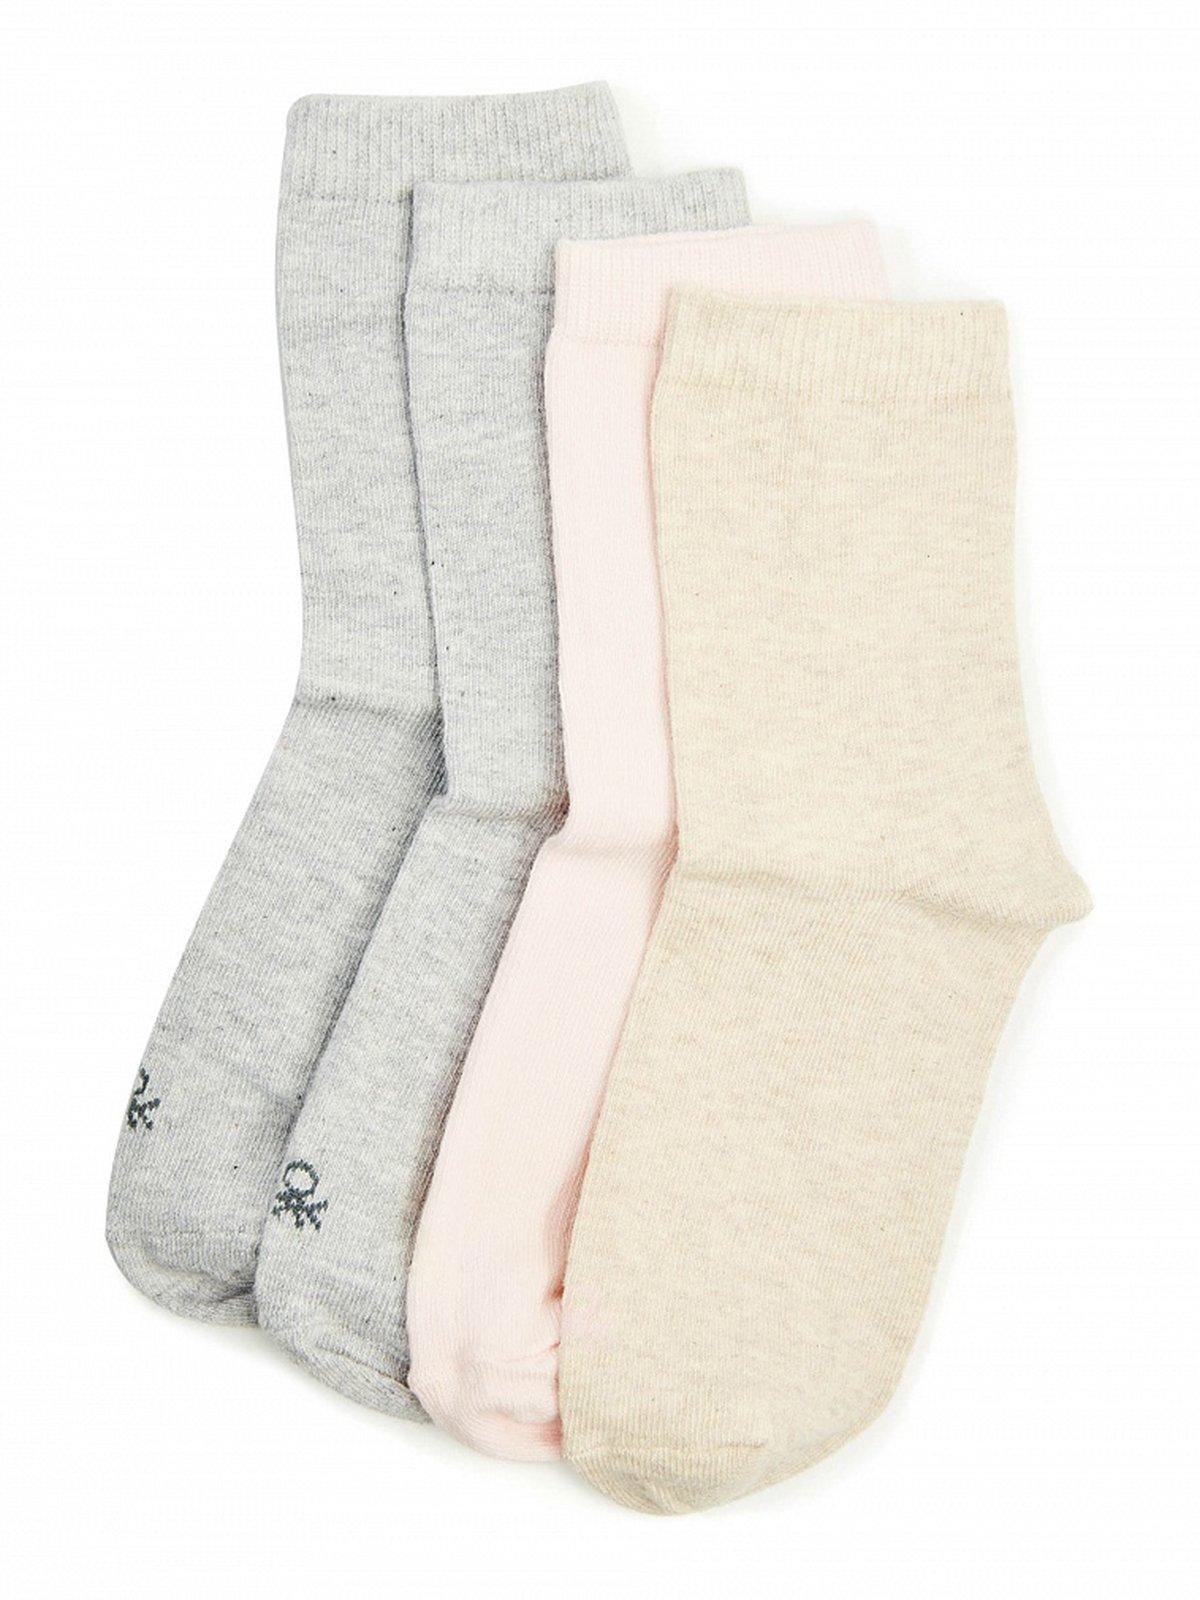 Набор носков (4 пары)   3520736